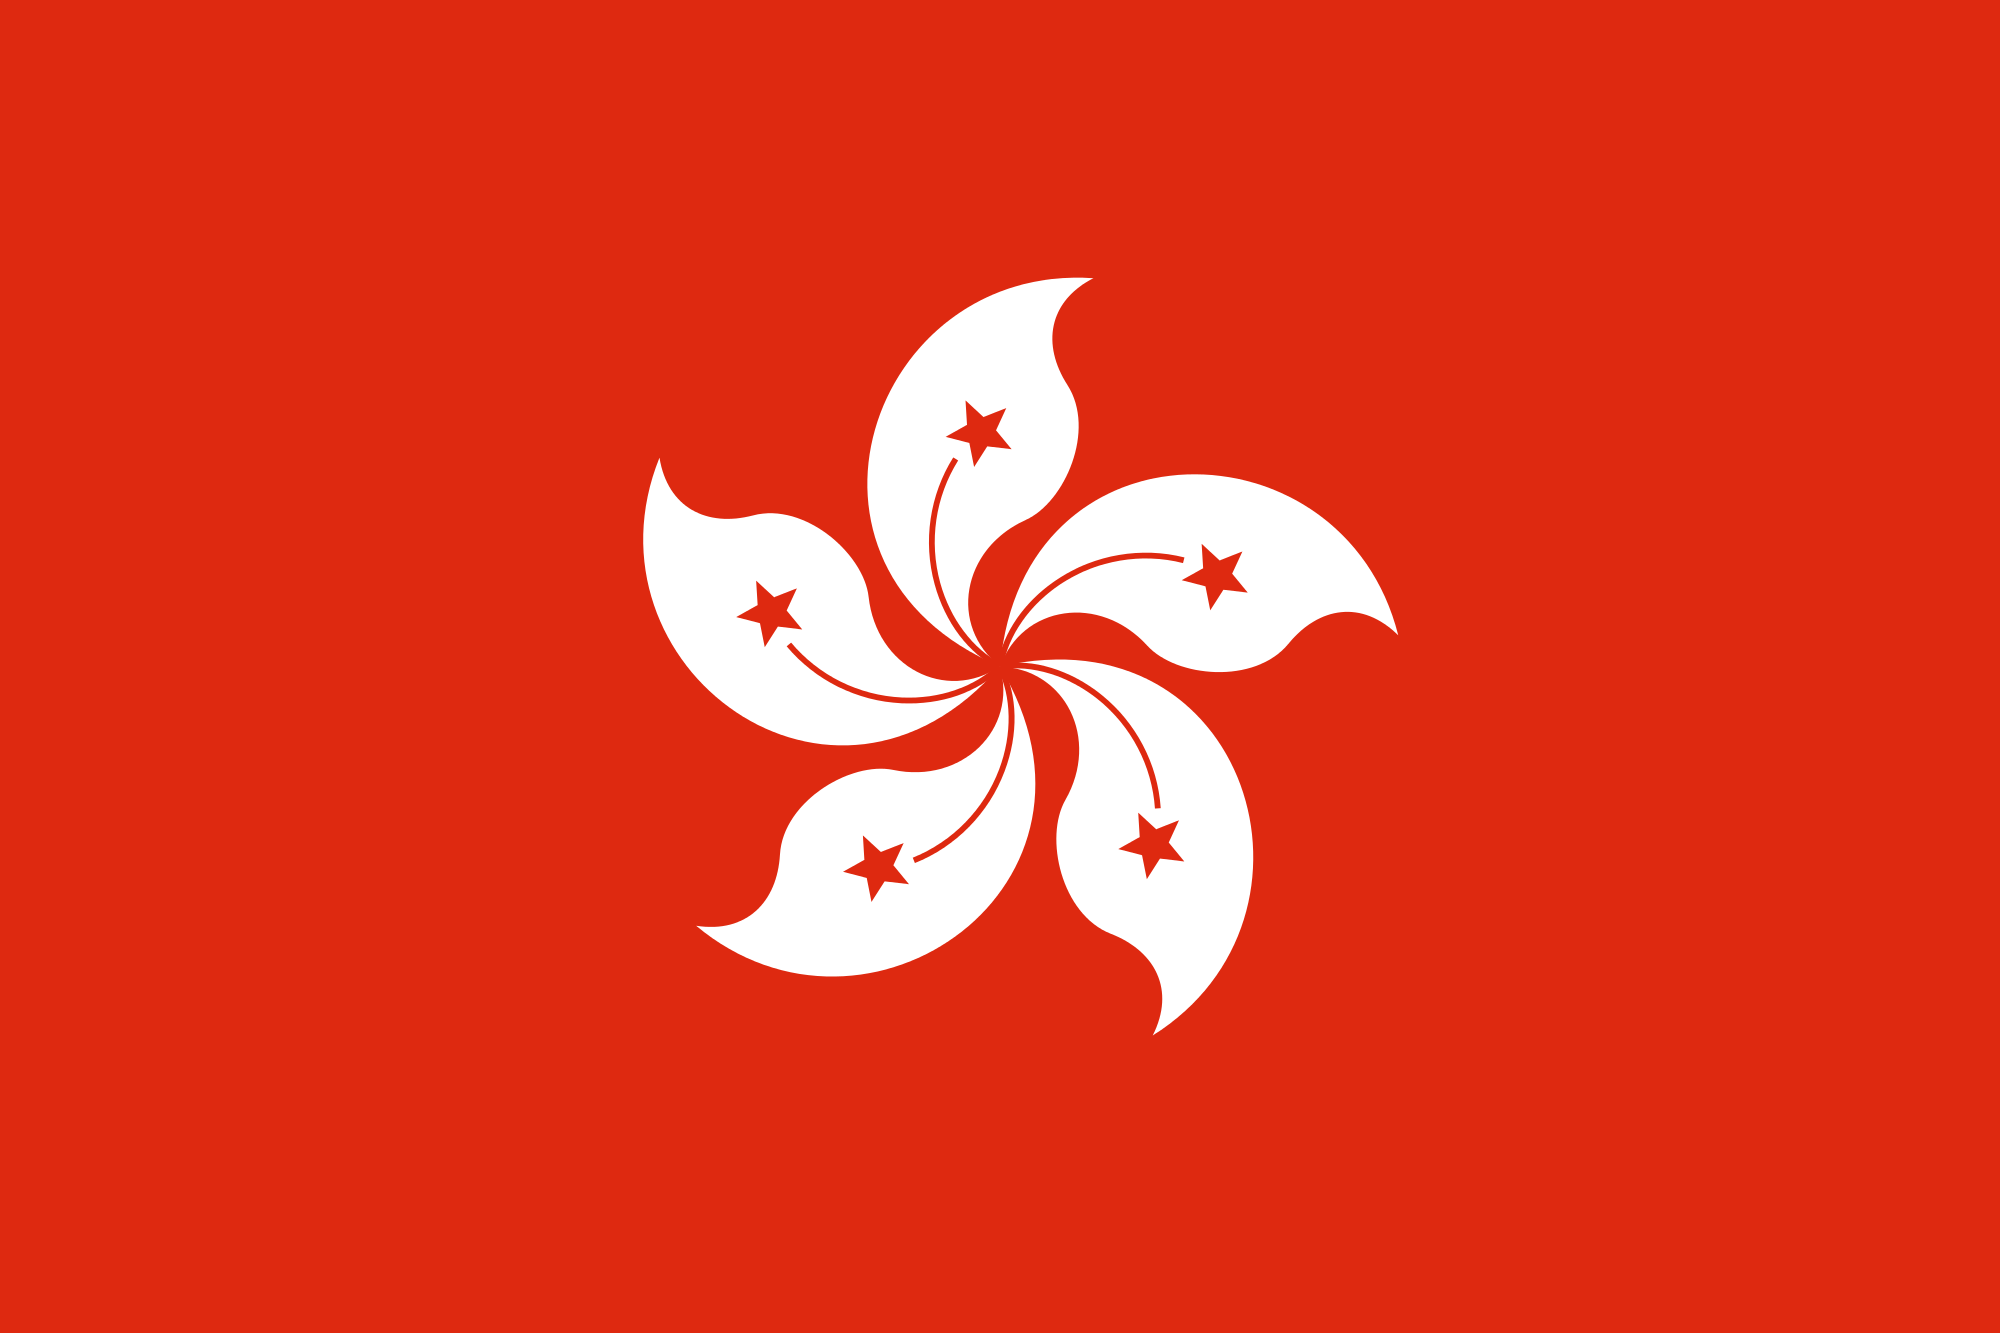 hong kong, 国家, 会徽, 徽标, 符号 - 高清壁纸 - 教授-falken.com